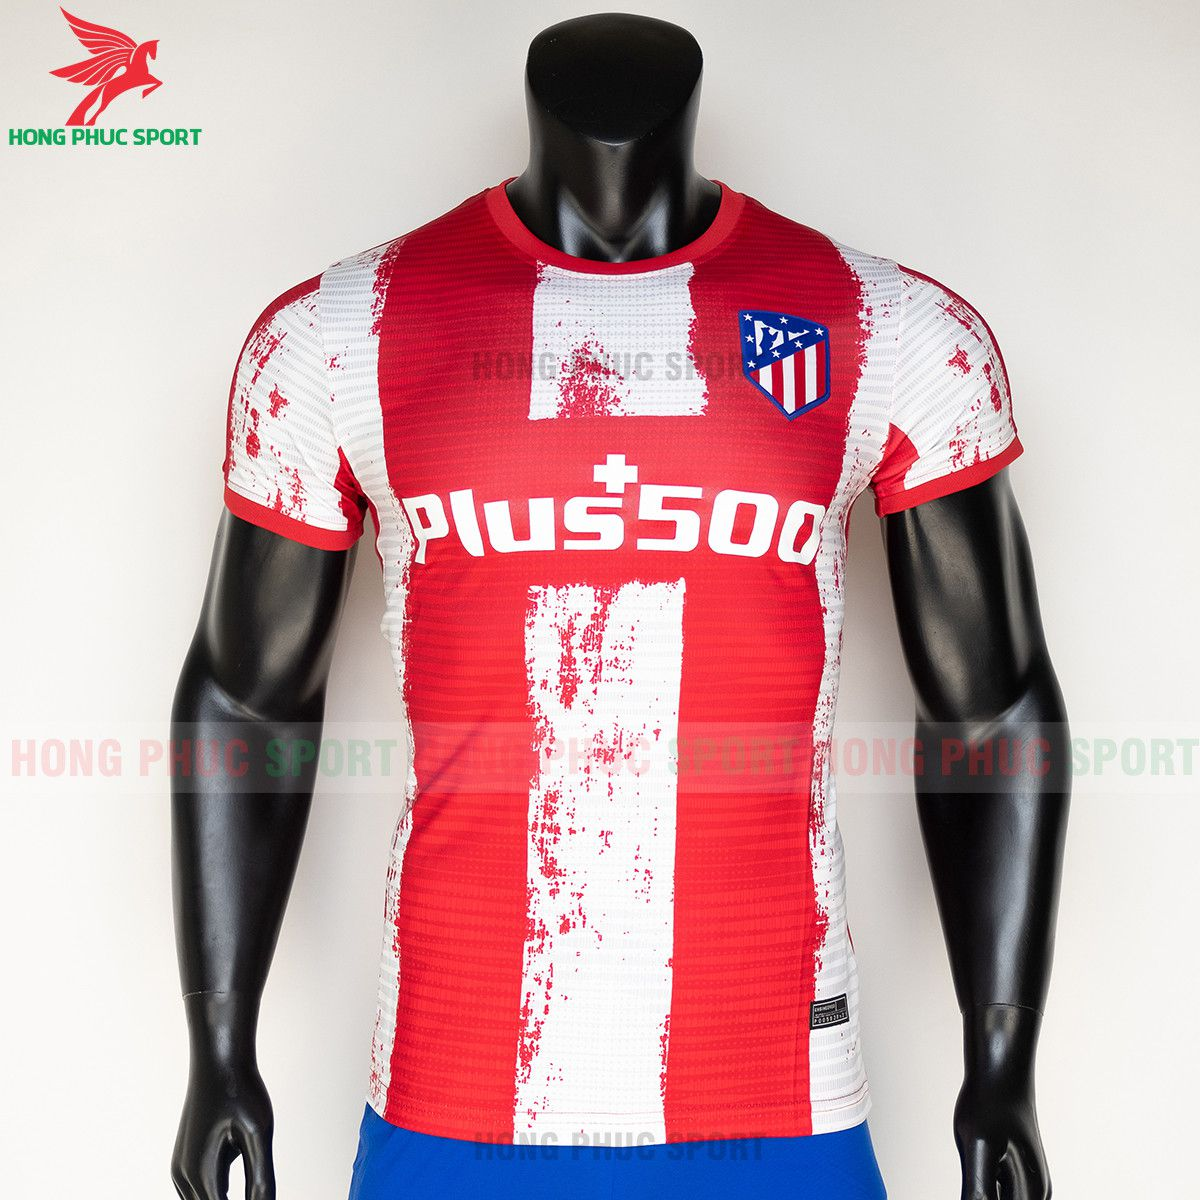 https://cdn.hongphucsport.com/unsafe/s4.shopbay.vn/files/285/ao-bong-da-atletico-madrid-2021-22-san-nha-thailand-7-61558e99e1320.jpg